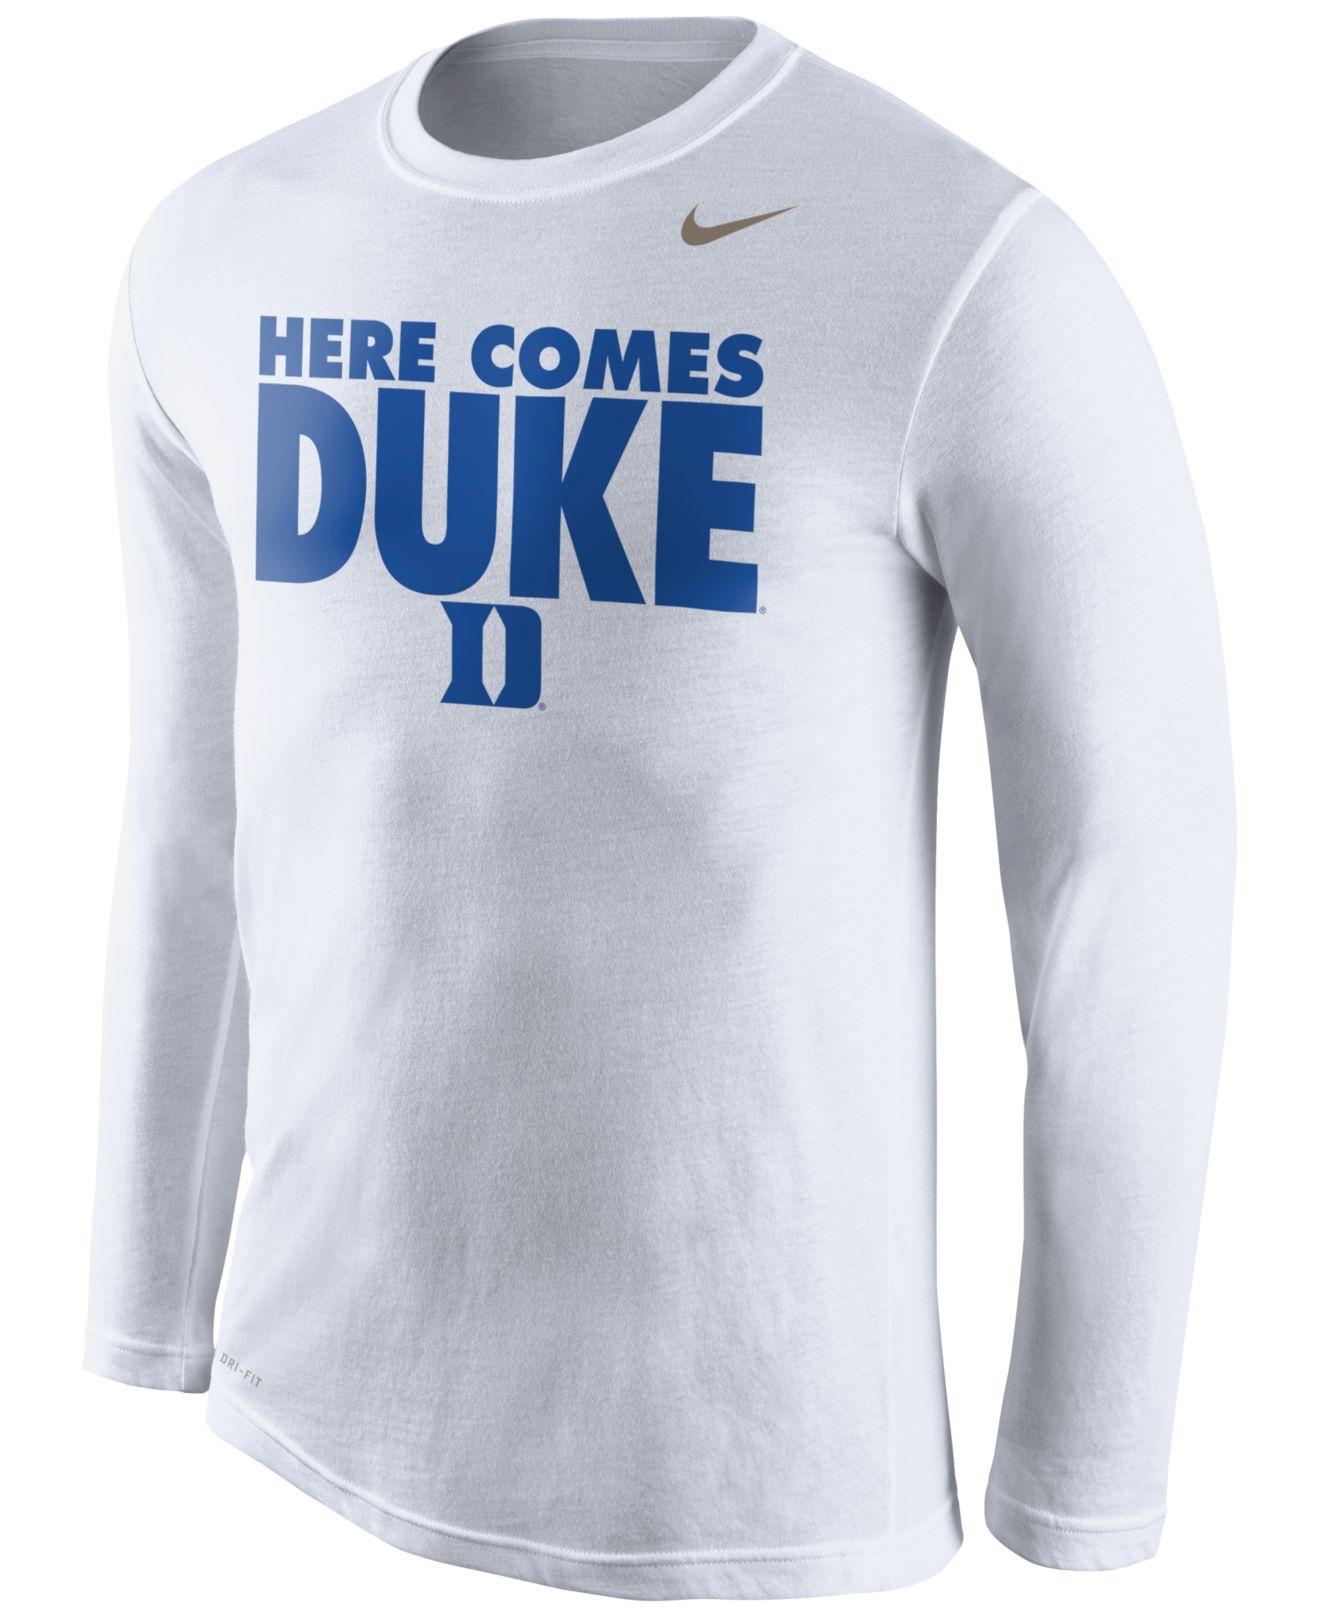 7589c0c96e8 Lyst - Nike Men'S Long-Sleeve Duke Blue Devils Dri-Fit Warmup Legend ...